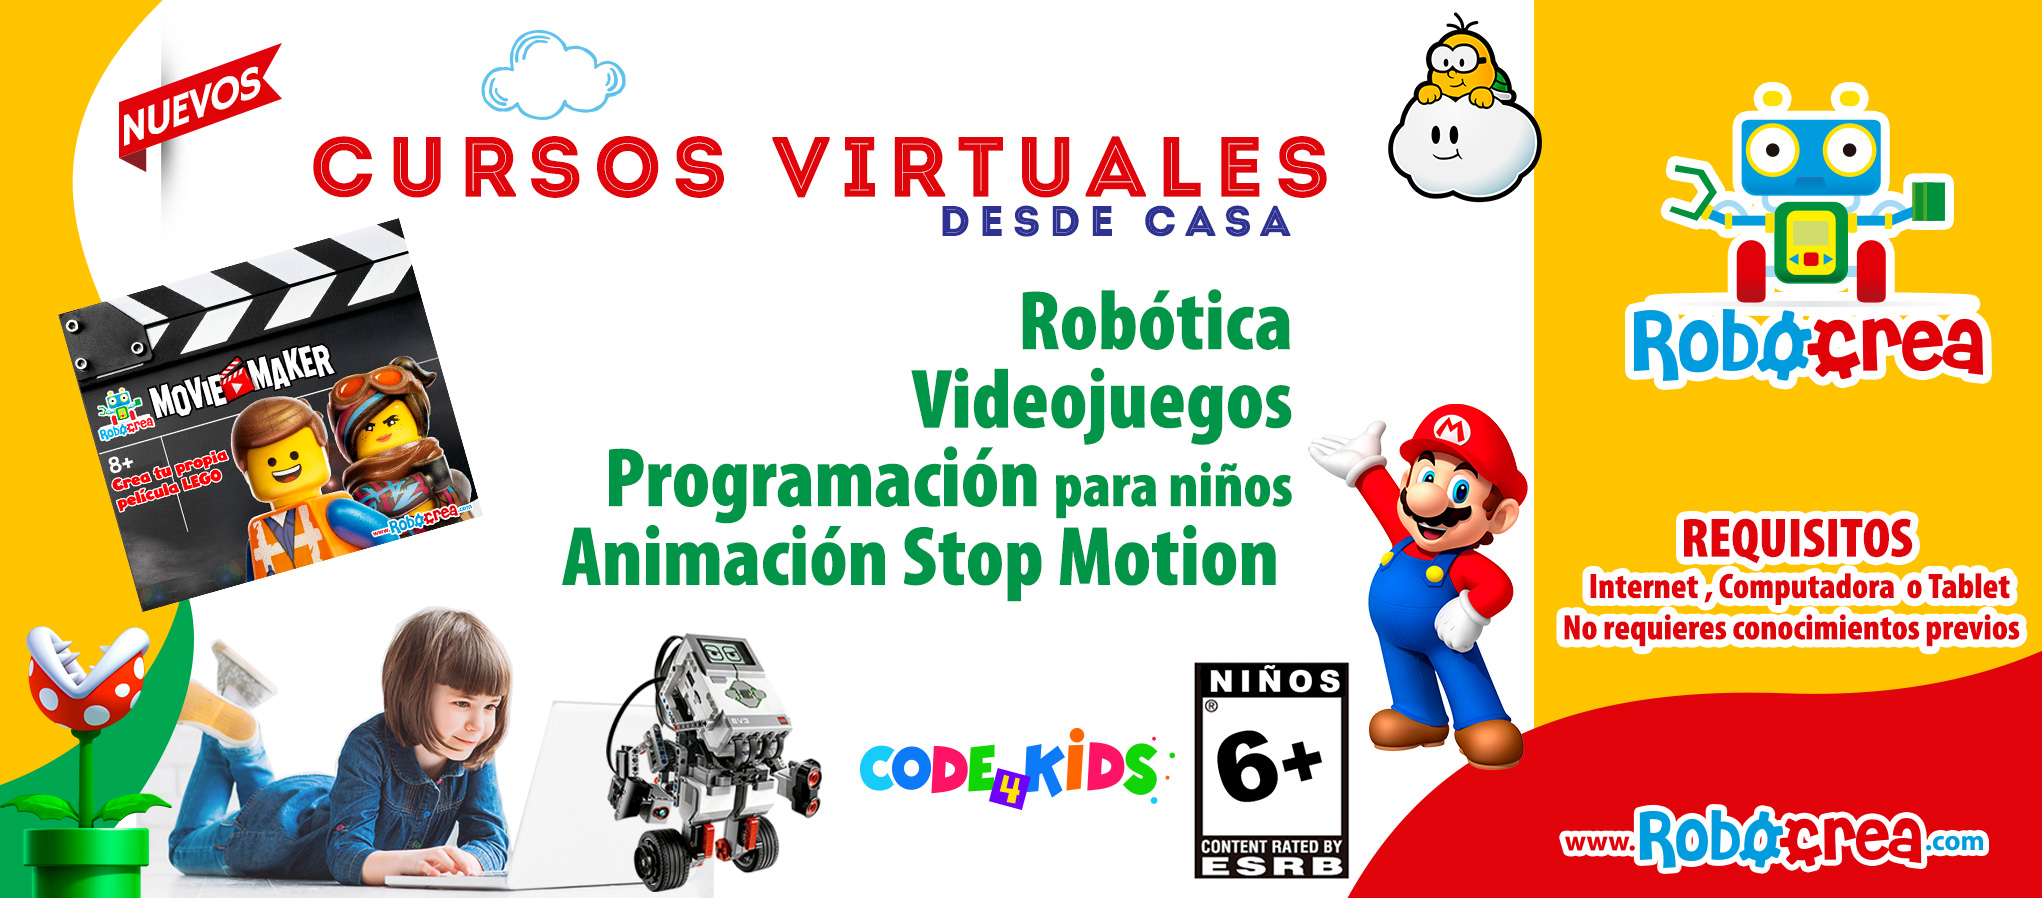 Flyer_web_CursosVirtuales